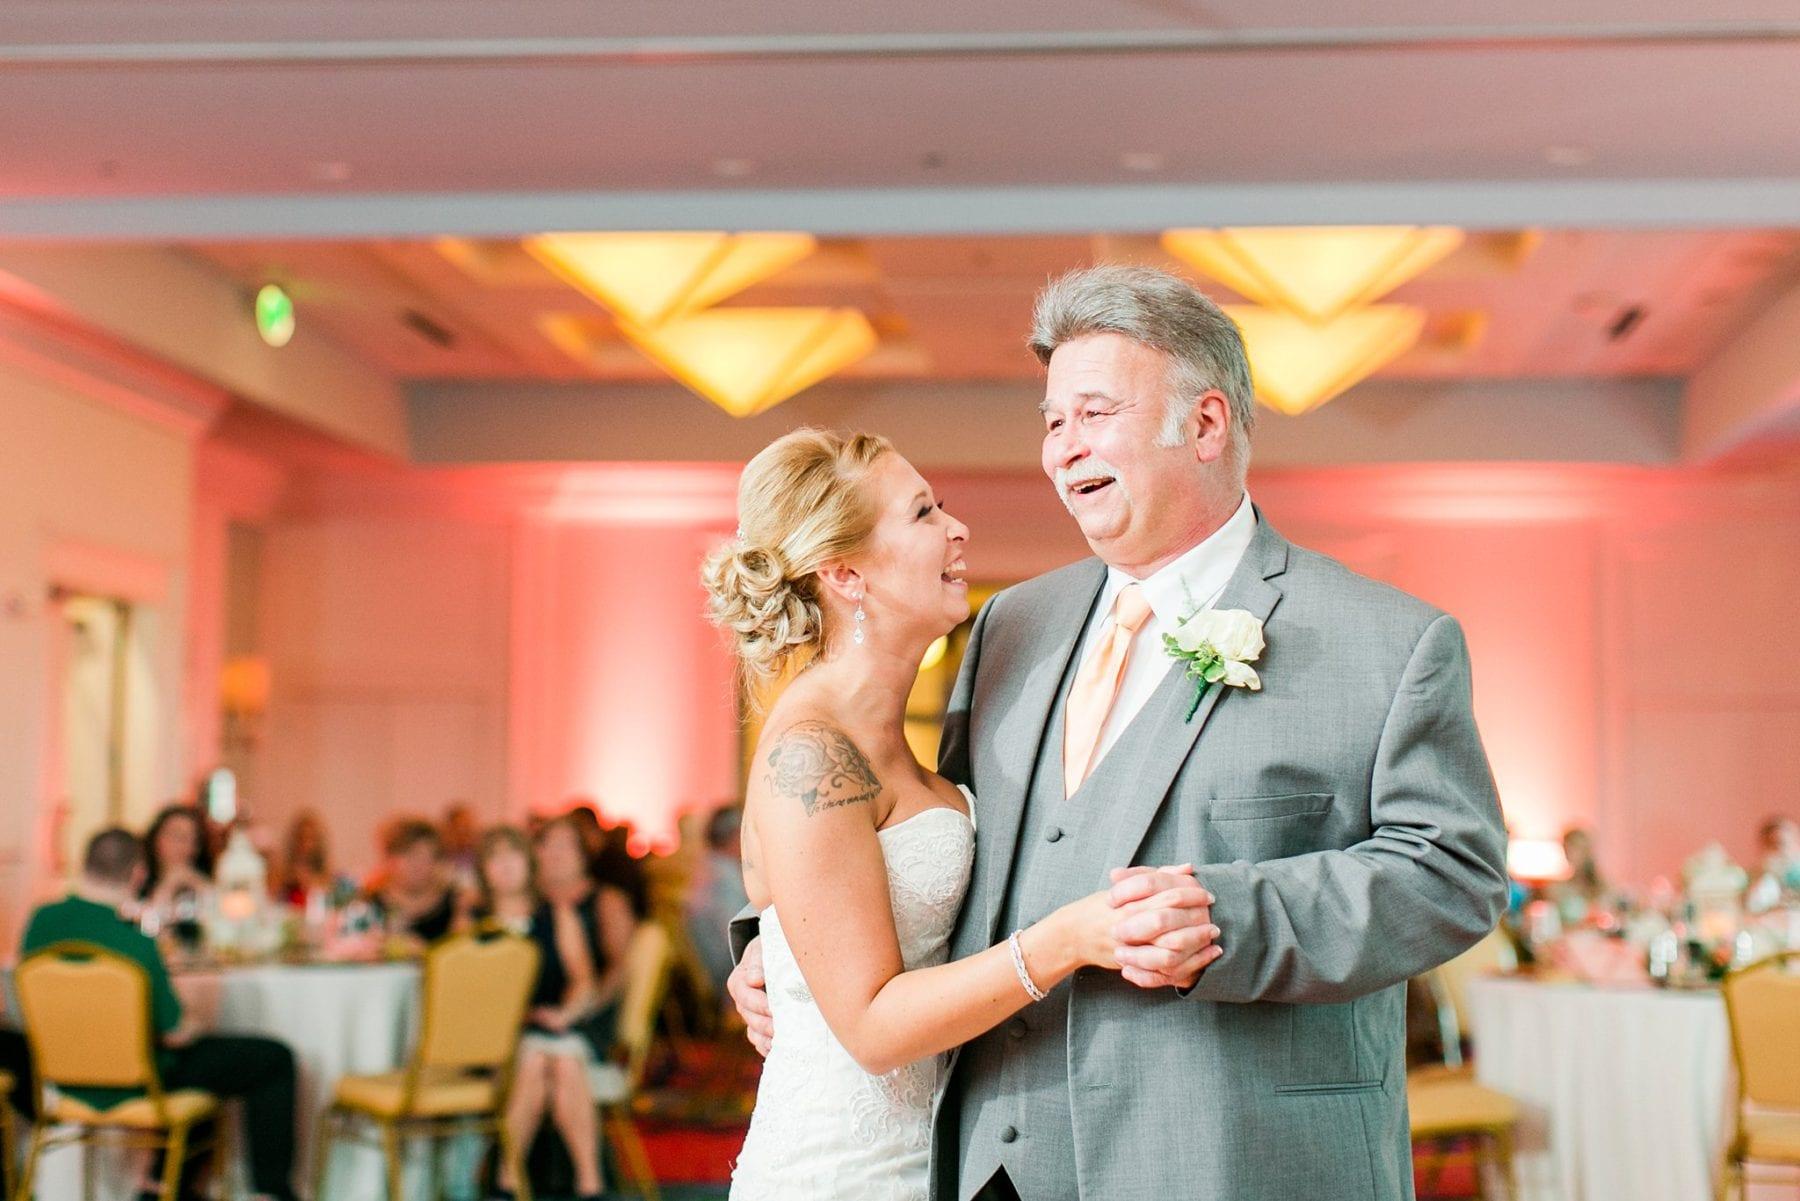 Waters Edge Wedding Photos Maryland Wedding Photographer Megan Kelsey Photography Katie & Conor-585.JPG